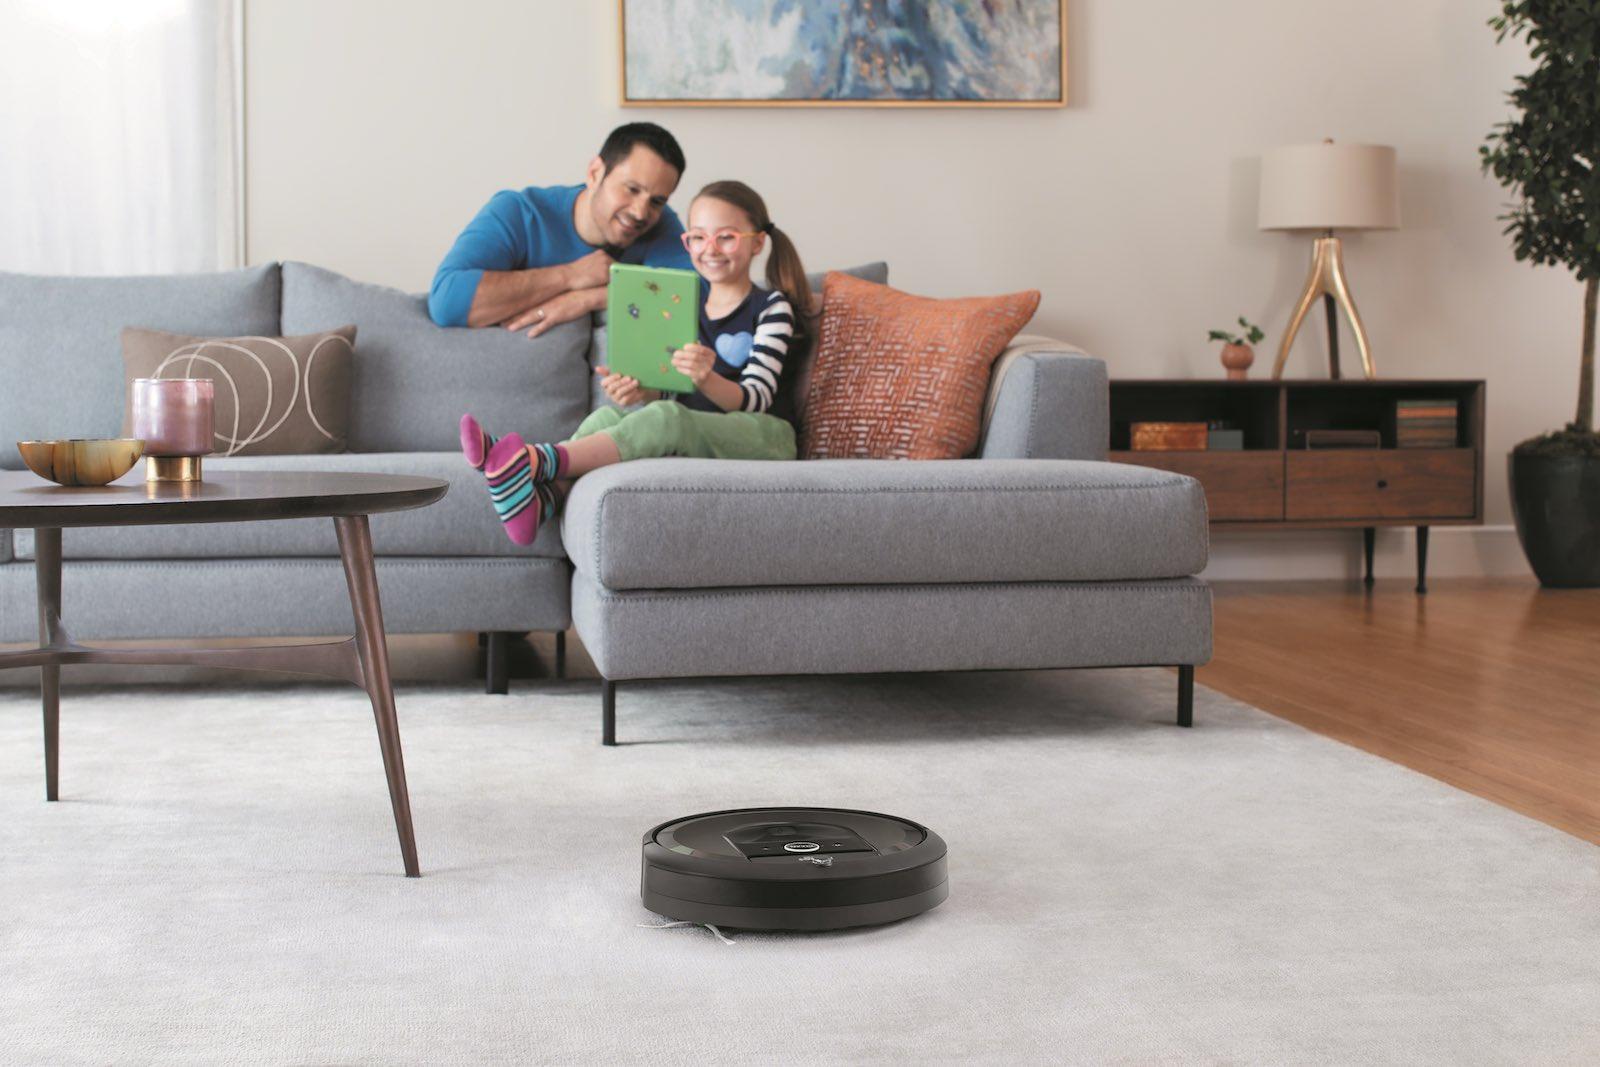 iRobot Roomba i7+ mit Clean BaseTM